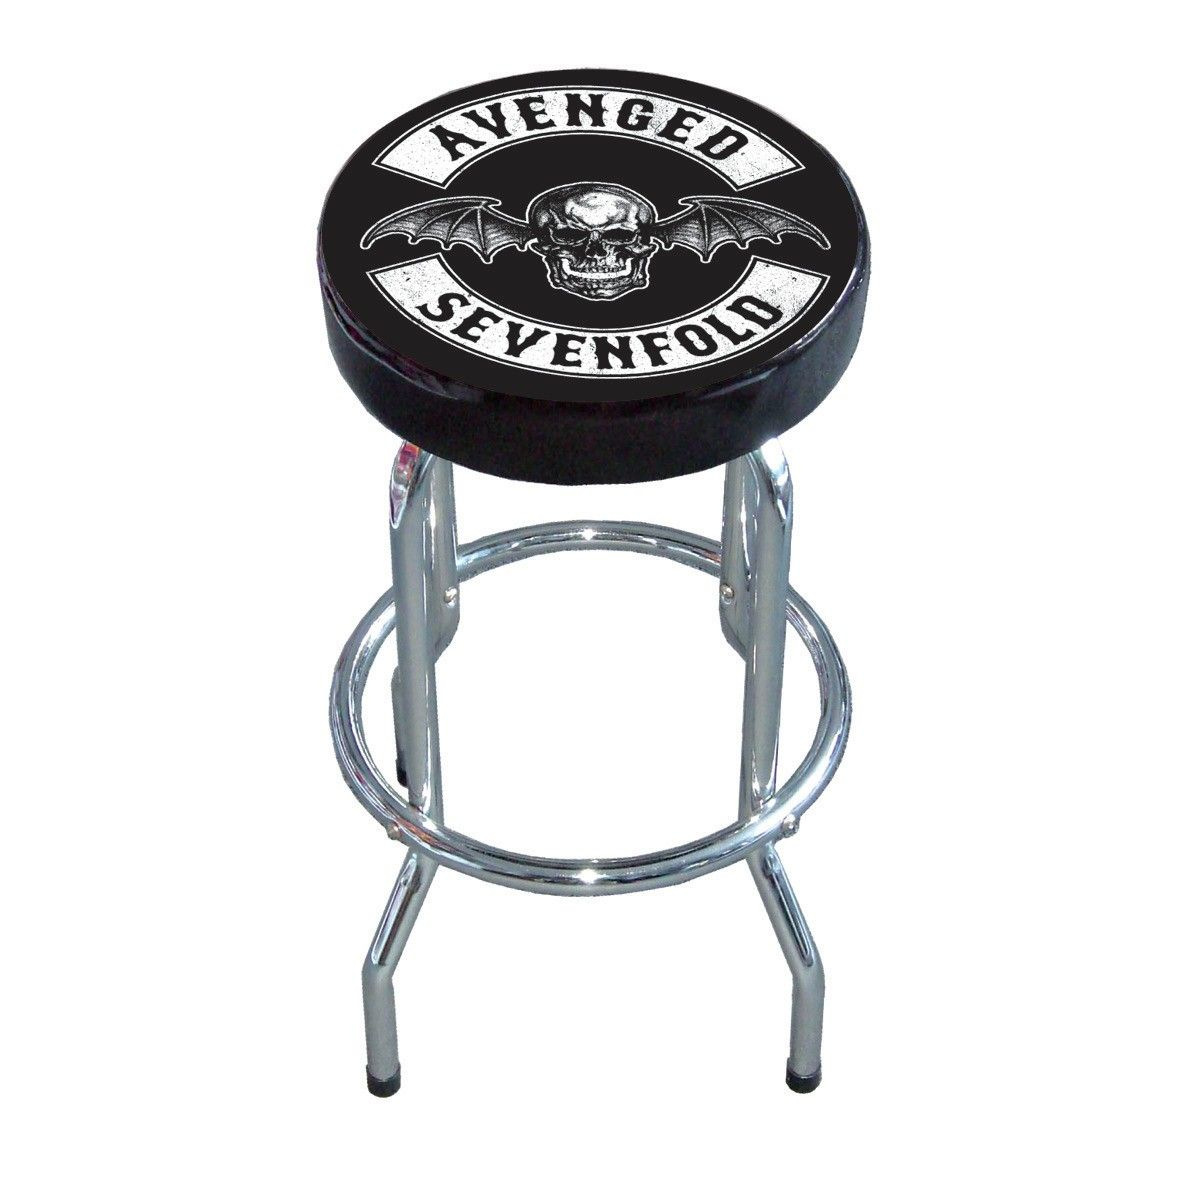 Bar Stool Avenged Sevenfold 59 99 Cool Bar Stools Bar